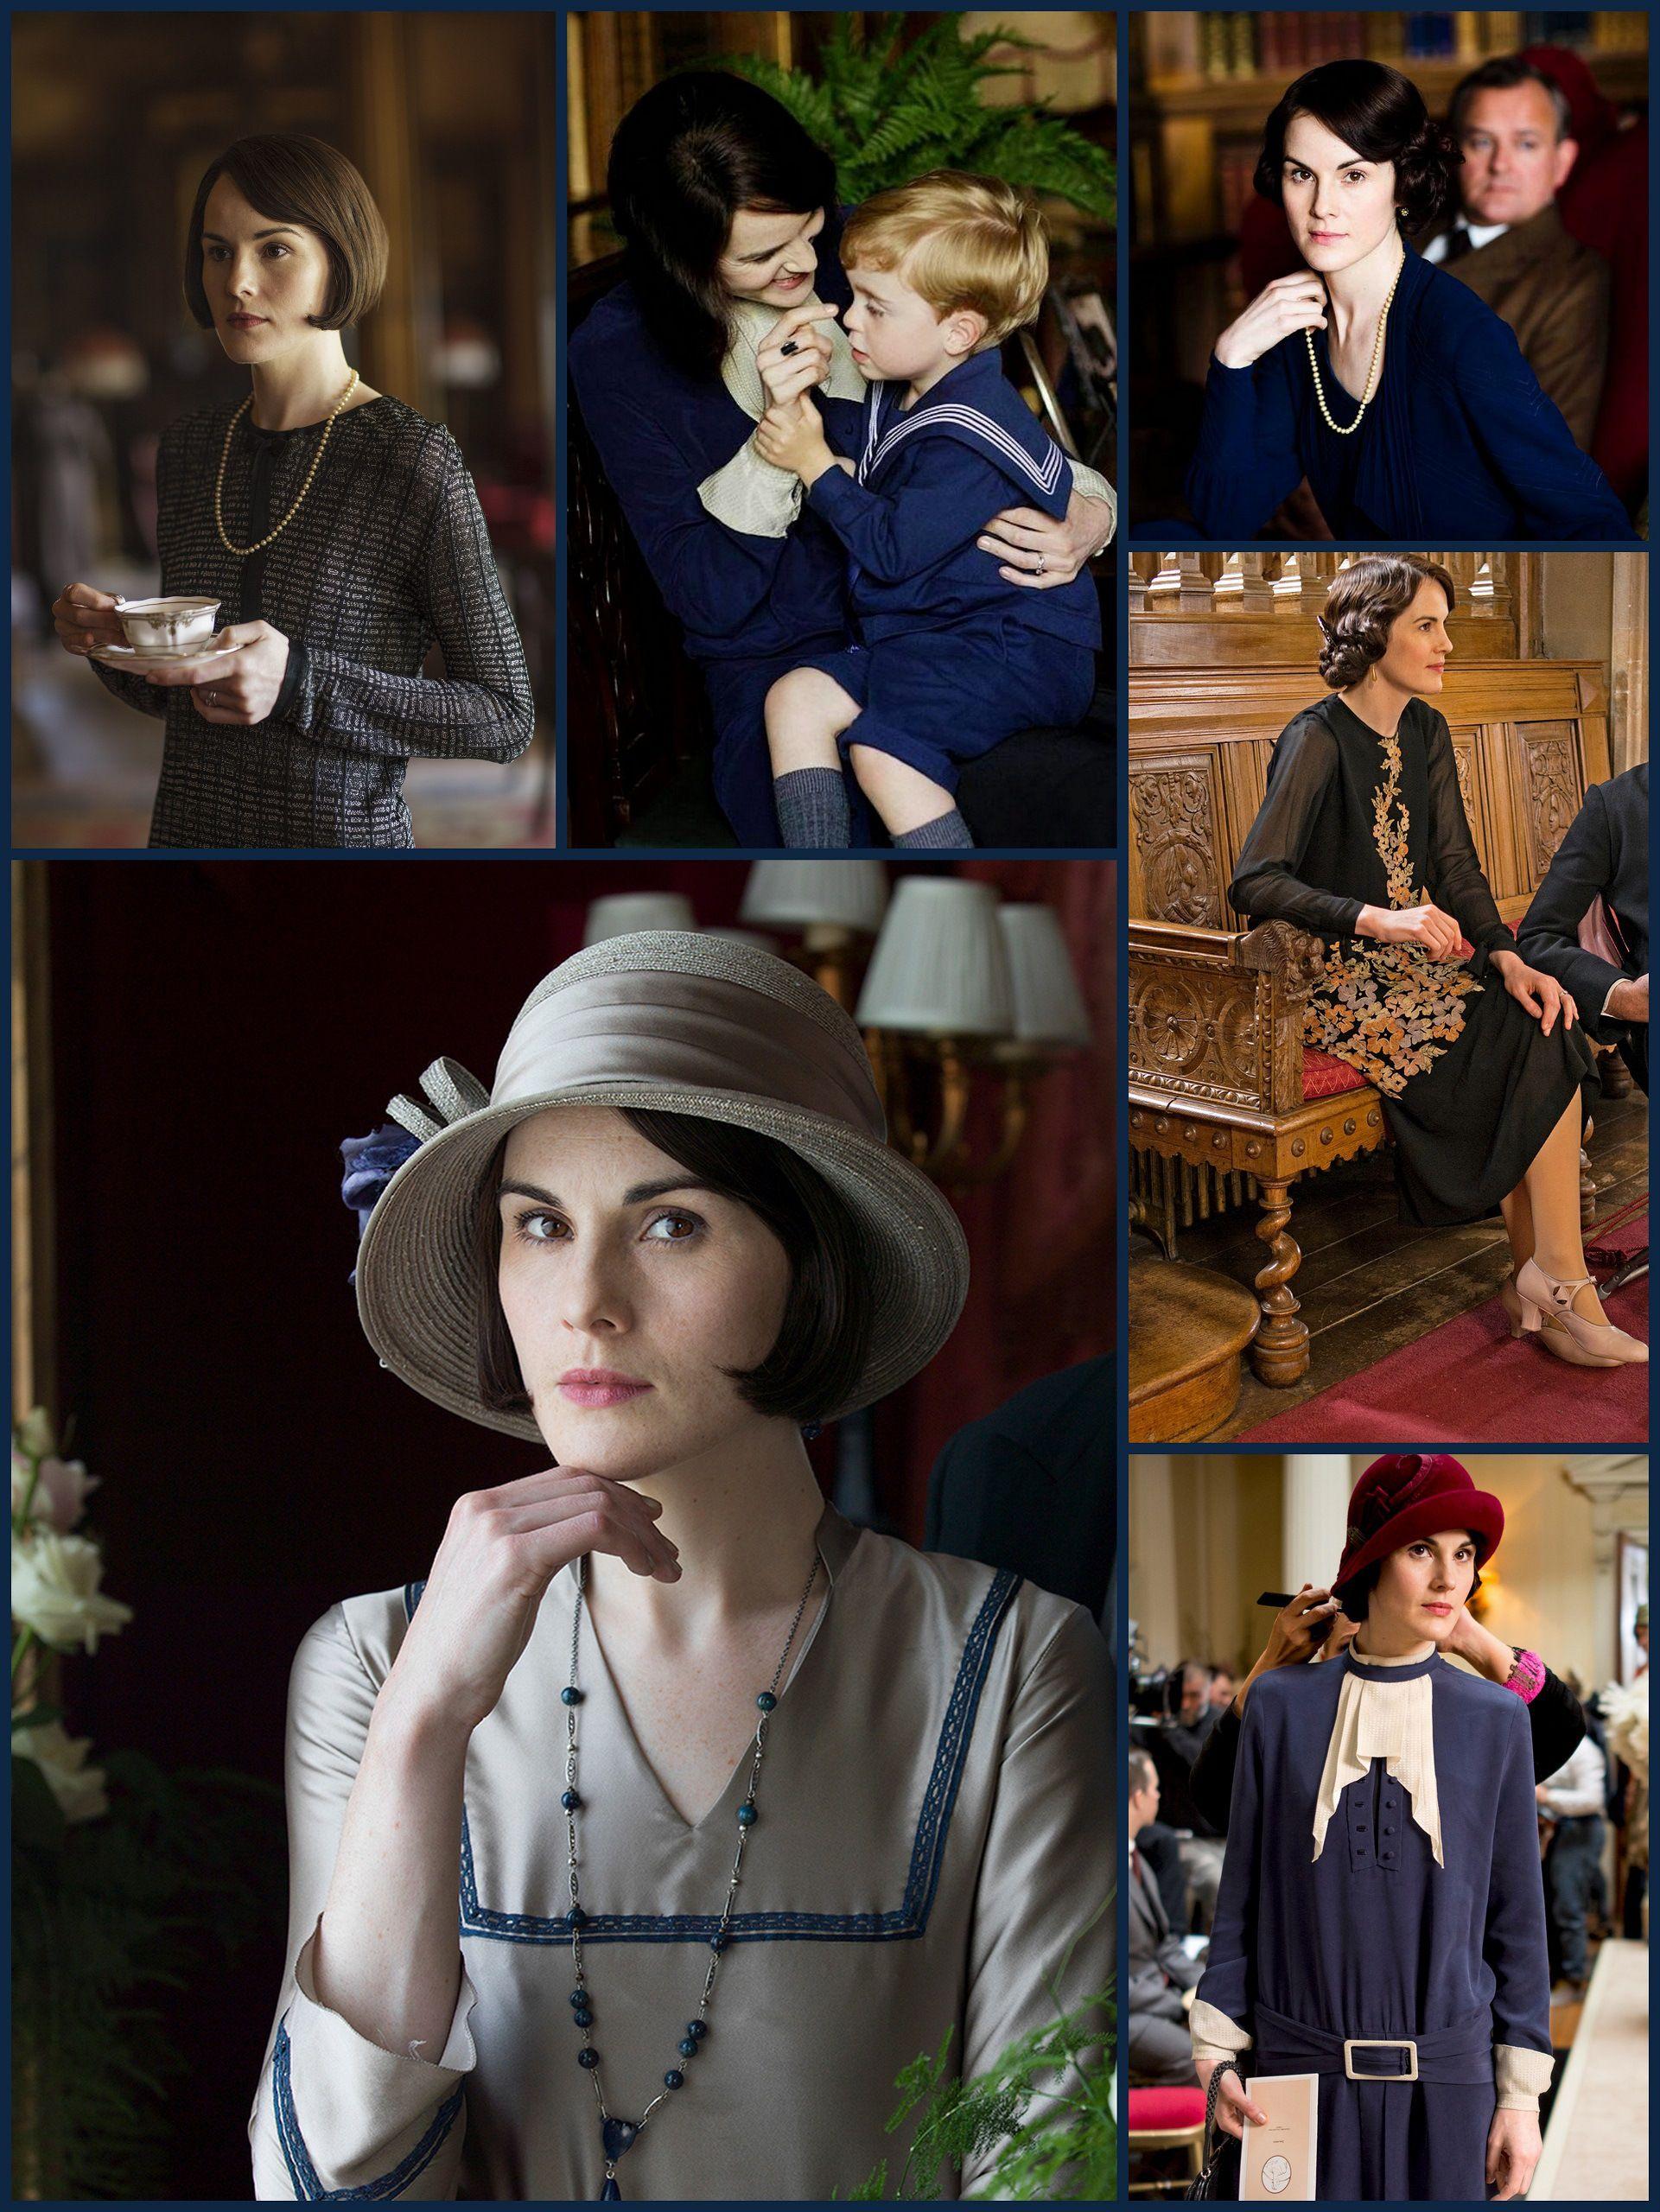 Downton Abbey La Mode Des Annees 1920 Saison 5 Downton Abbey Downton Abbey Fashion Downton